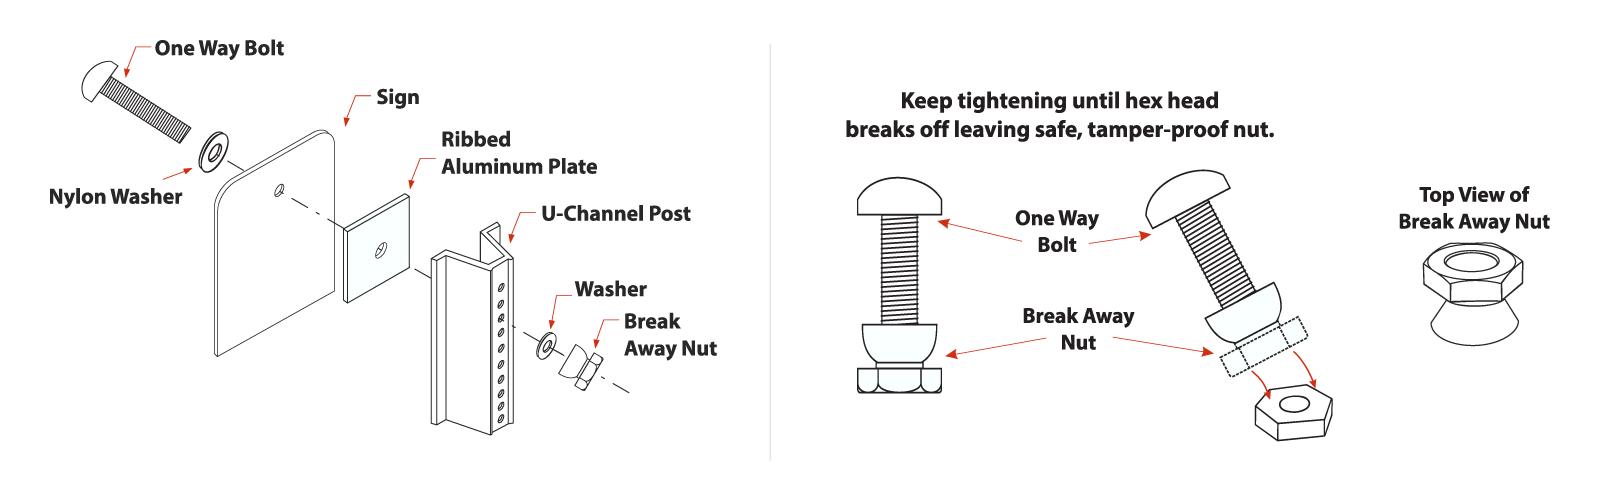 Tamper resistant sign mounting hardware